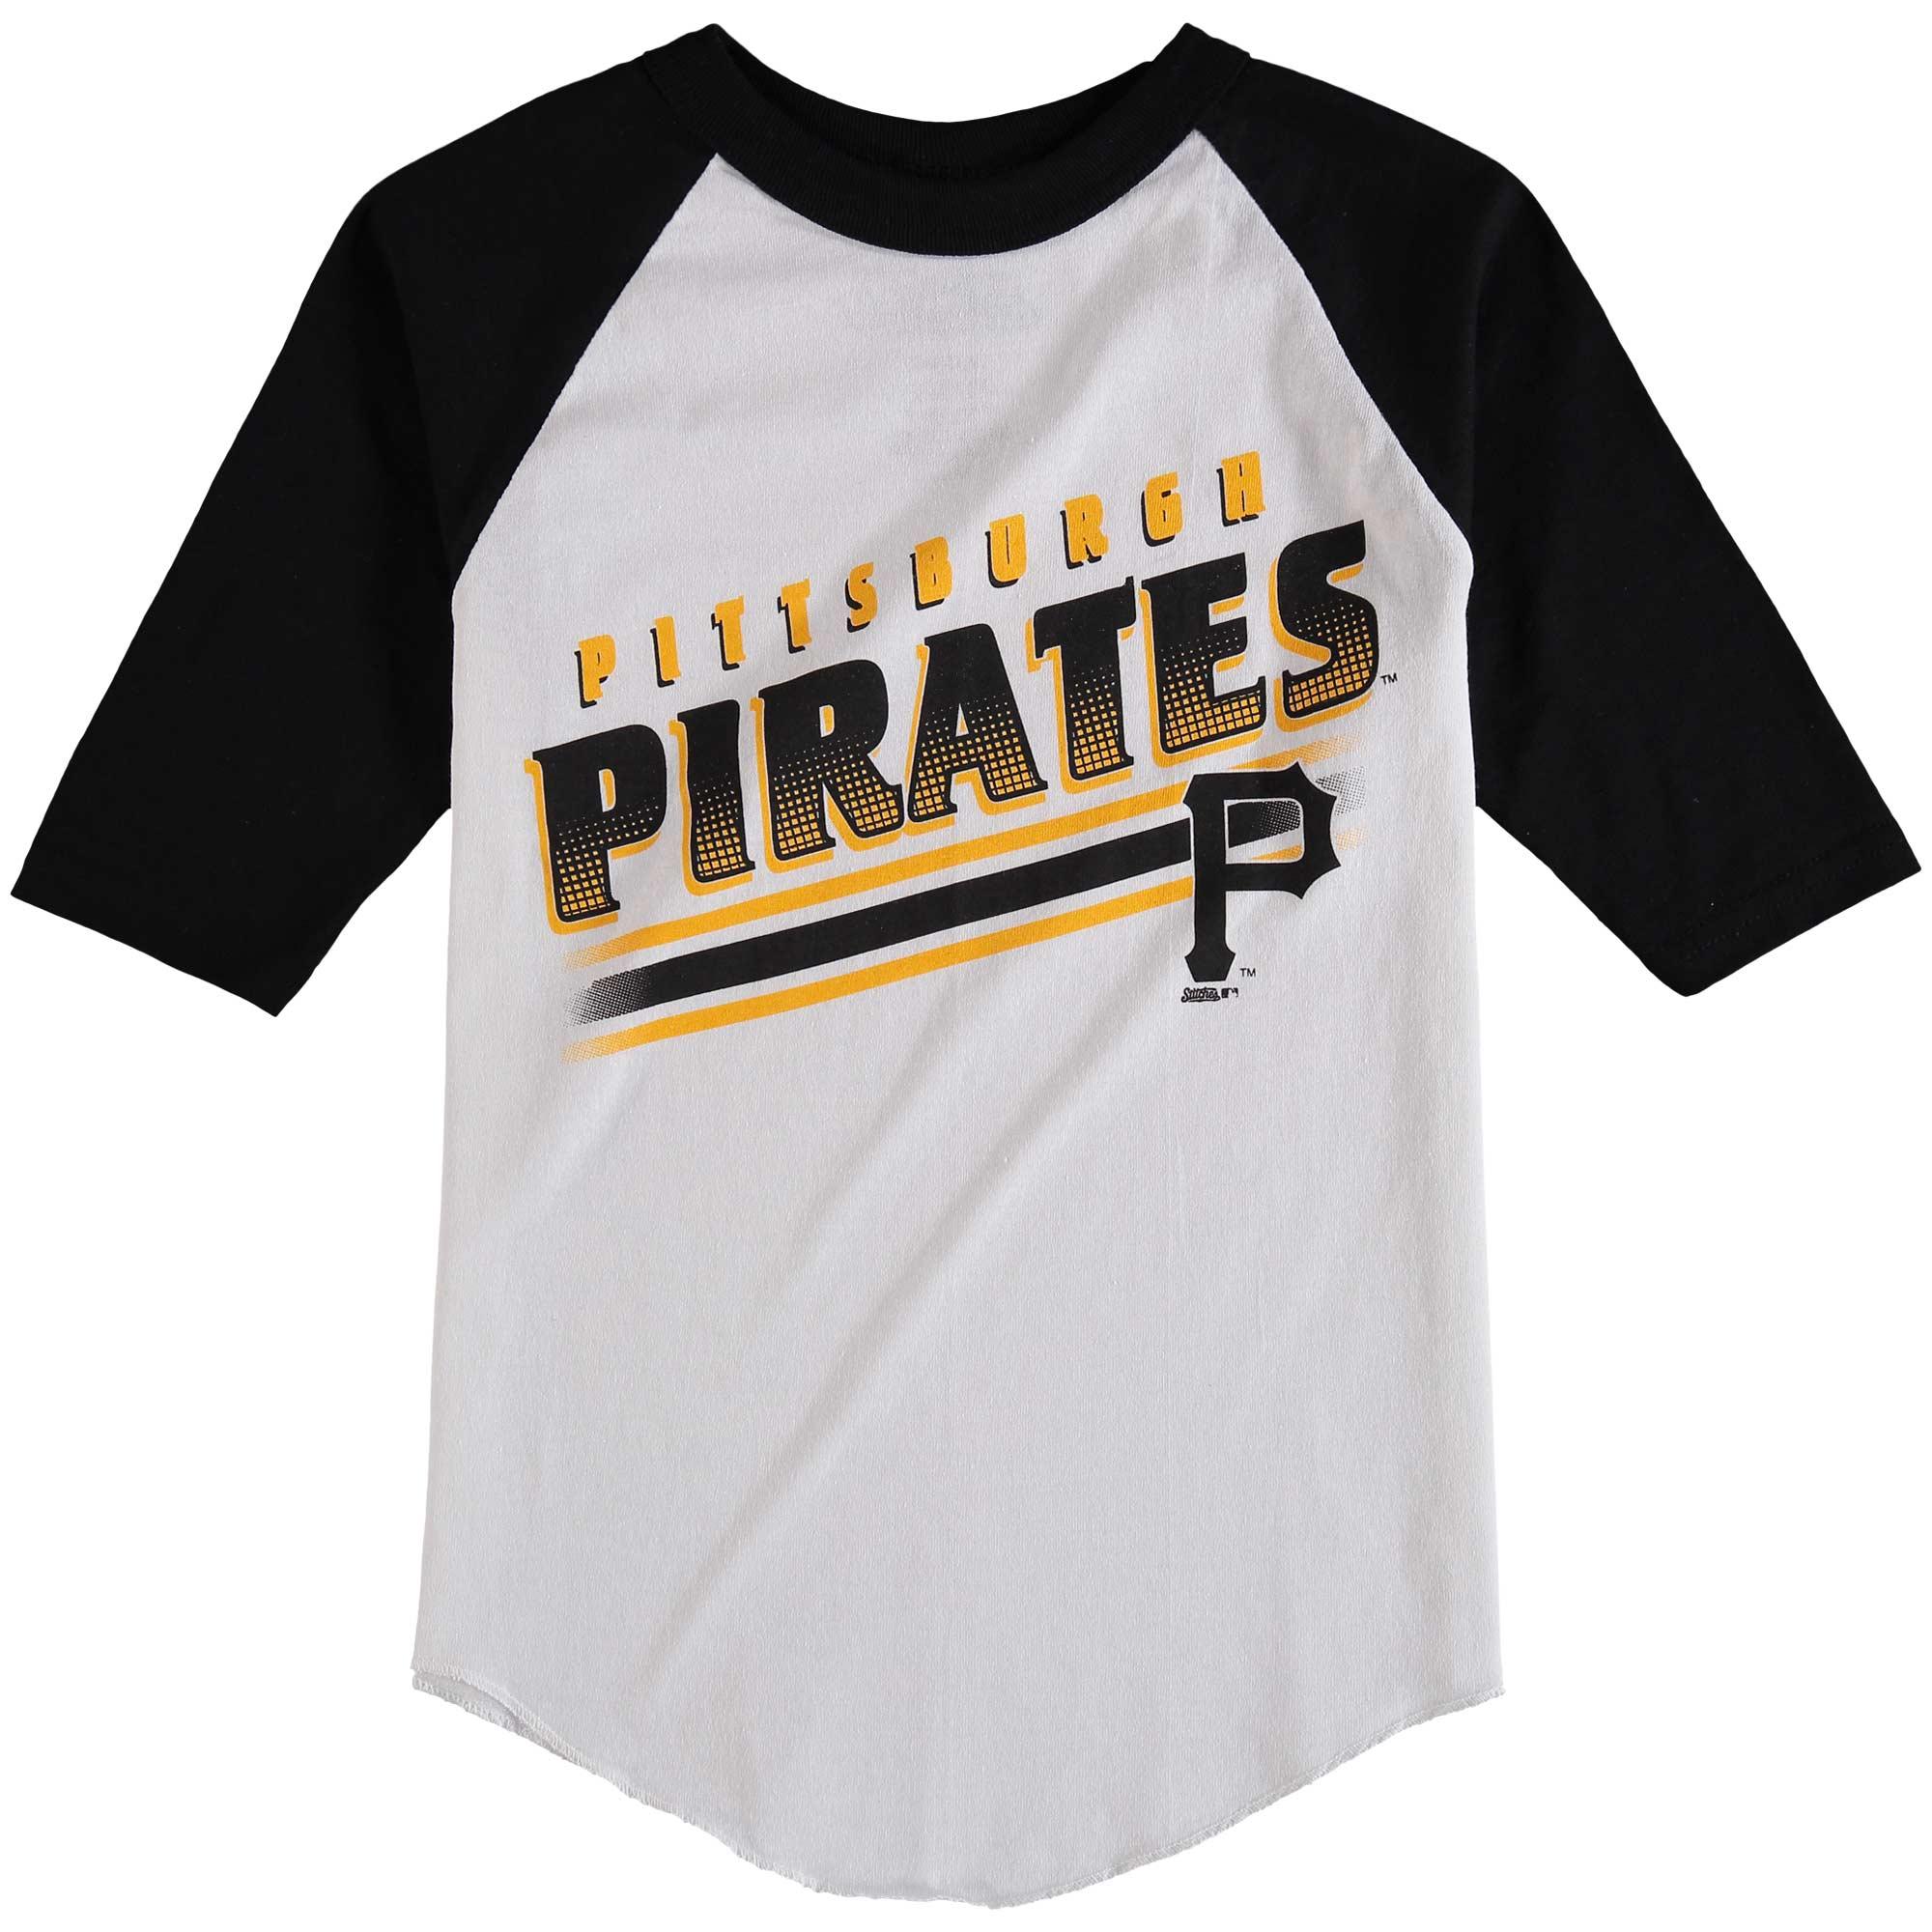 Pittsburgh Pirates Stitches Youth 3/4-Sleeve Raglan T-Shirt - White/Black